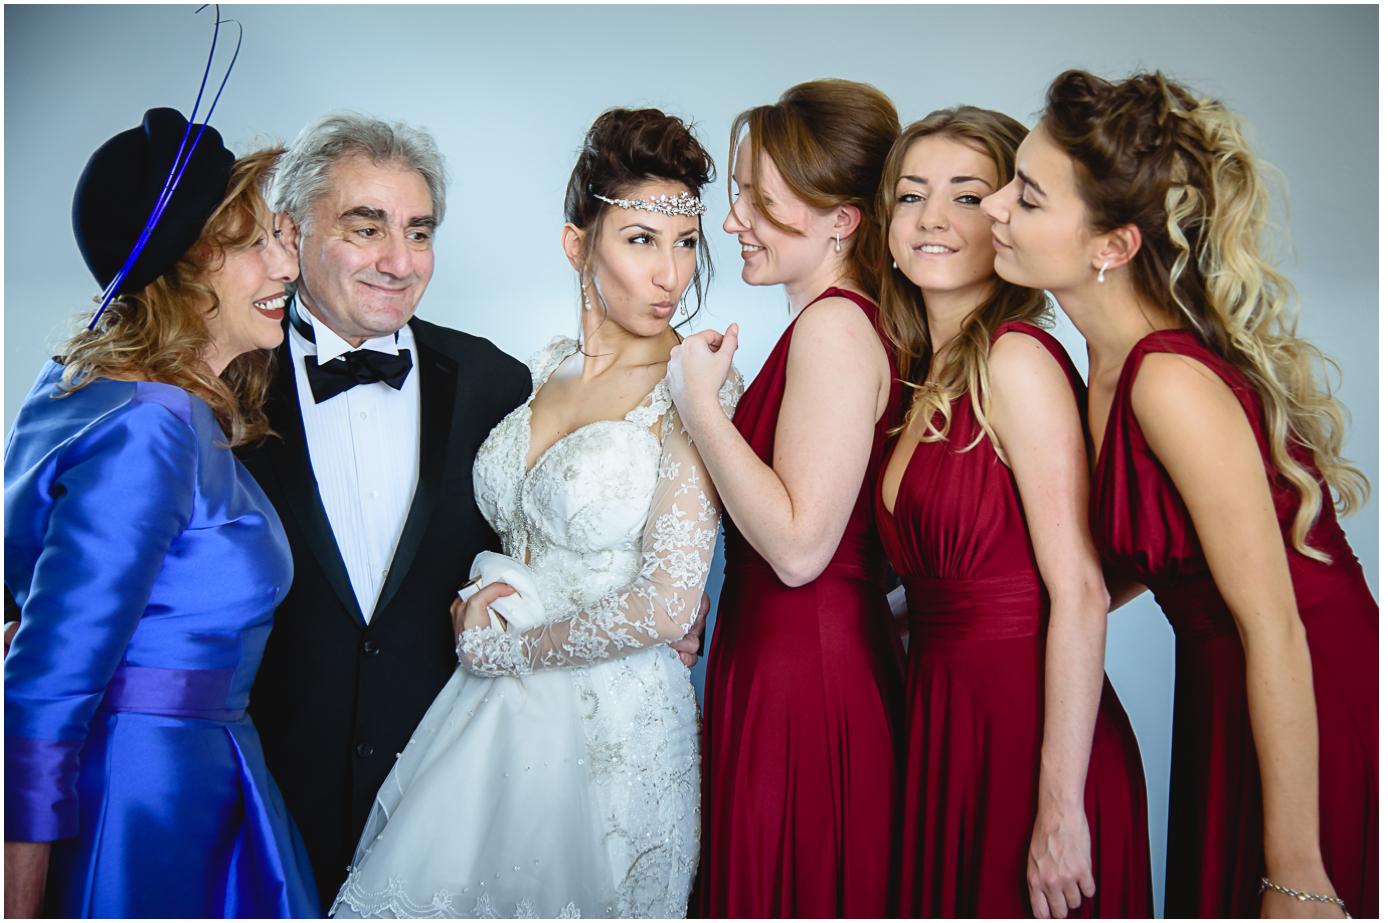 iranian wedding photographer 35 - Drapers Hall London Wedding Photographer